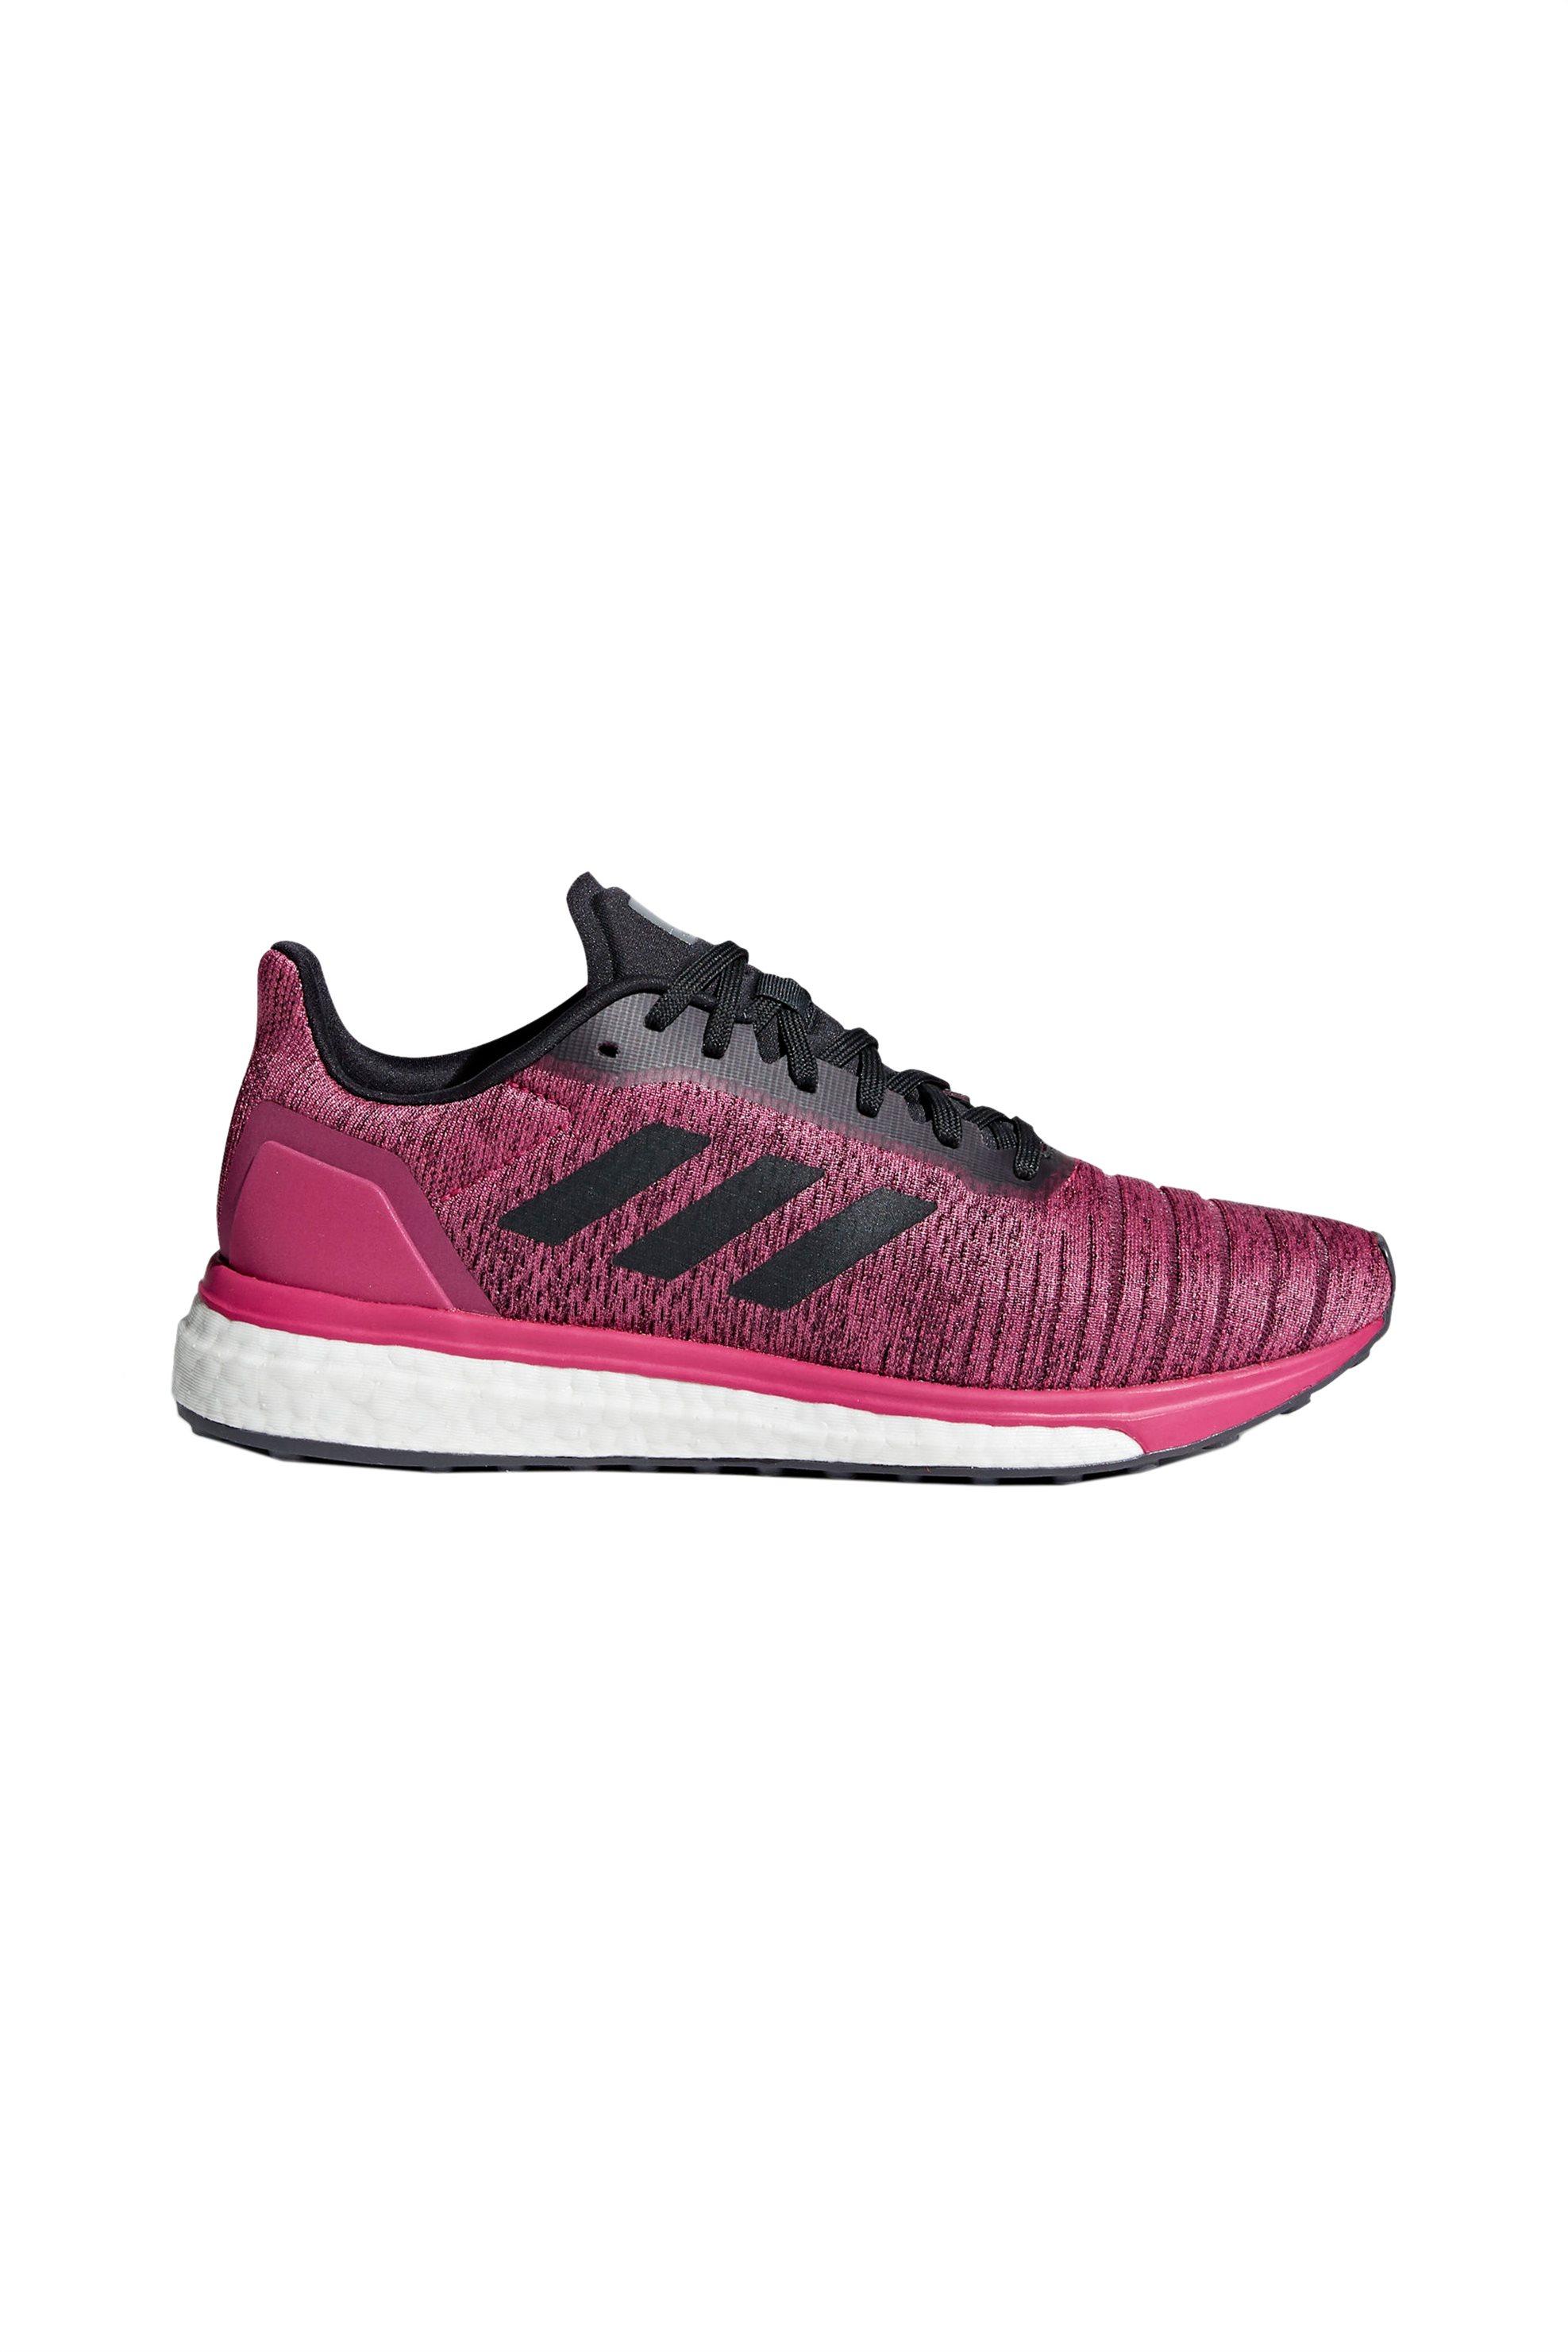 -30% Notos Adidas γυναικεία αθλητικά παπούτσια Solar Drive – AQ0339 – Φούξια 5bdff405097